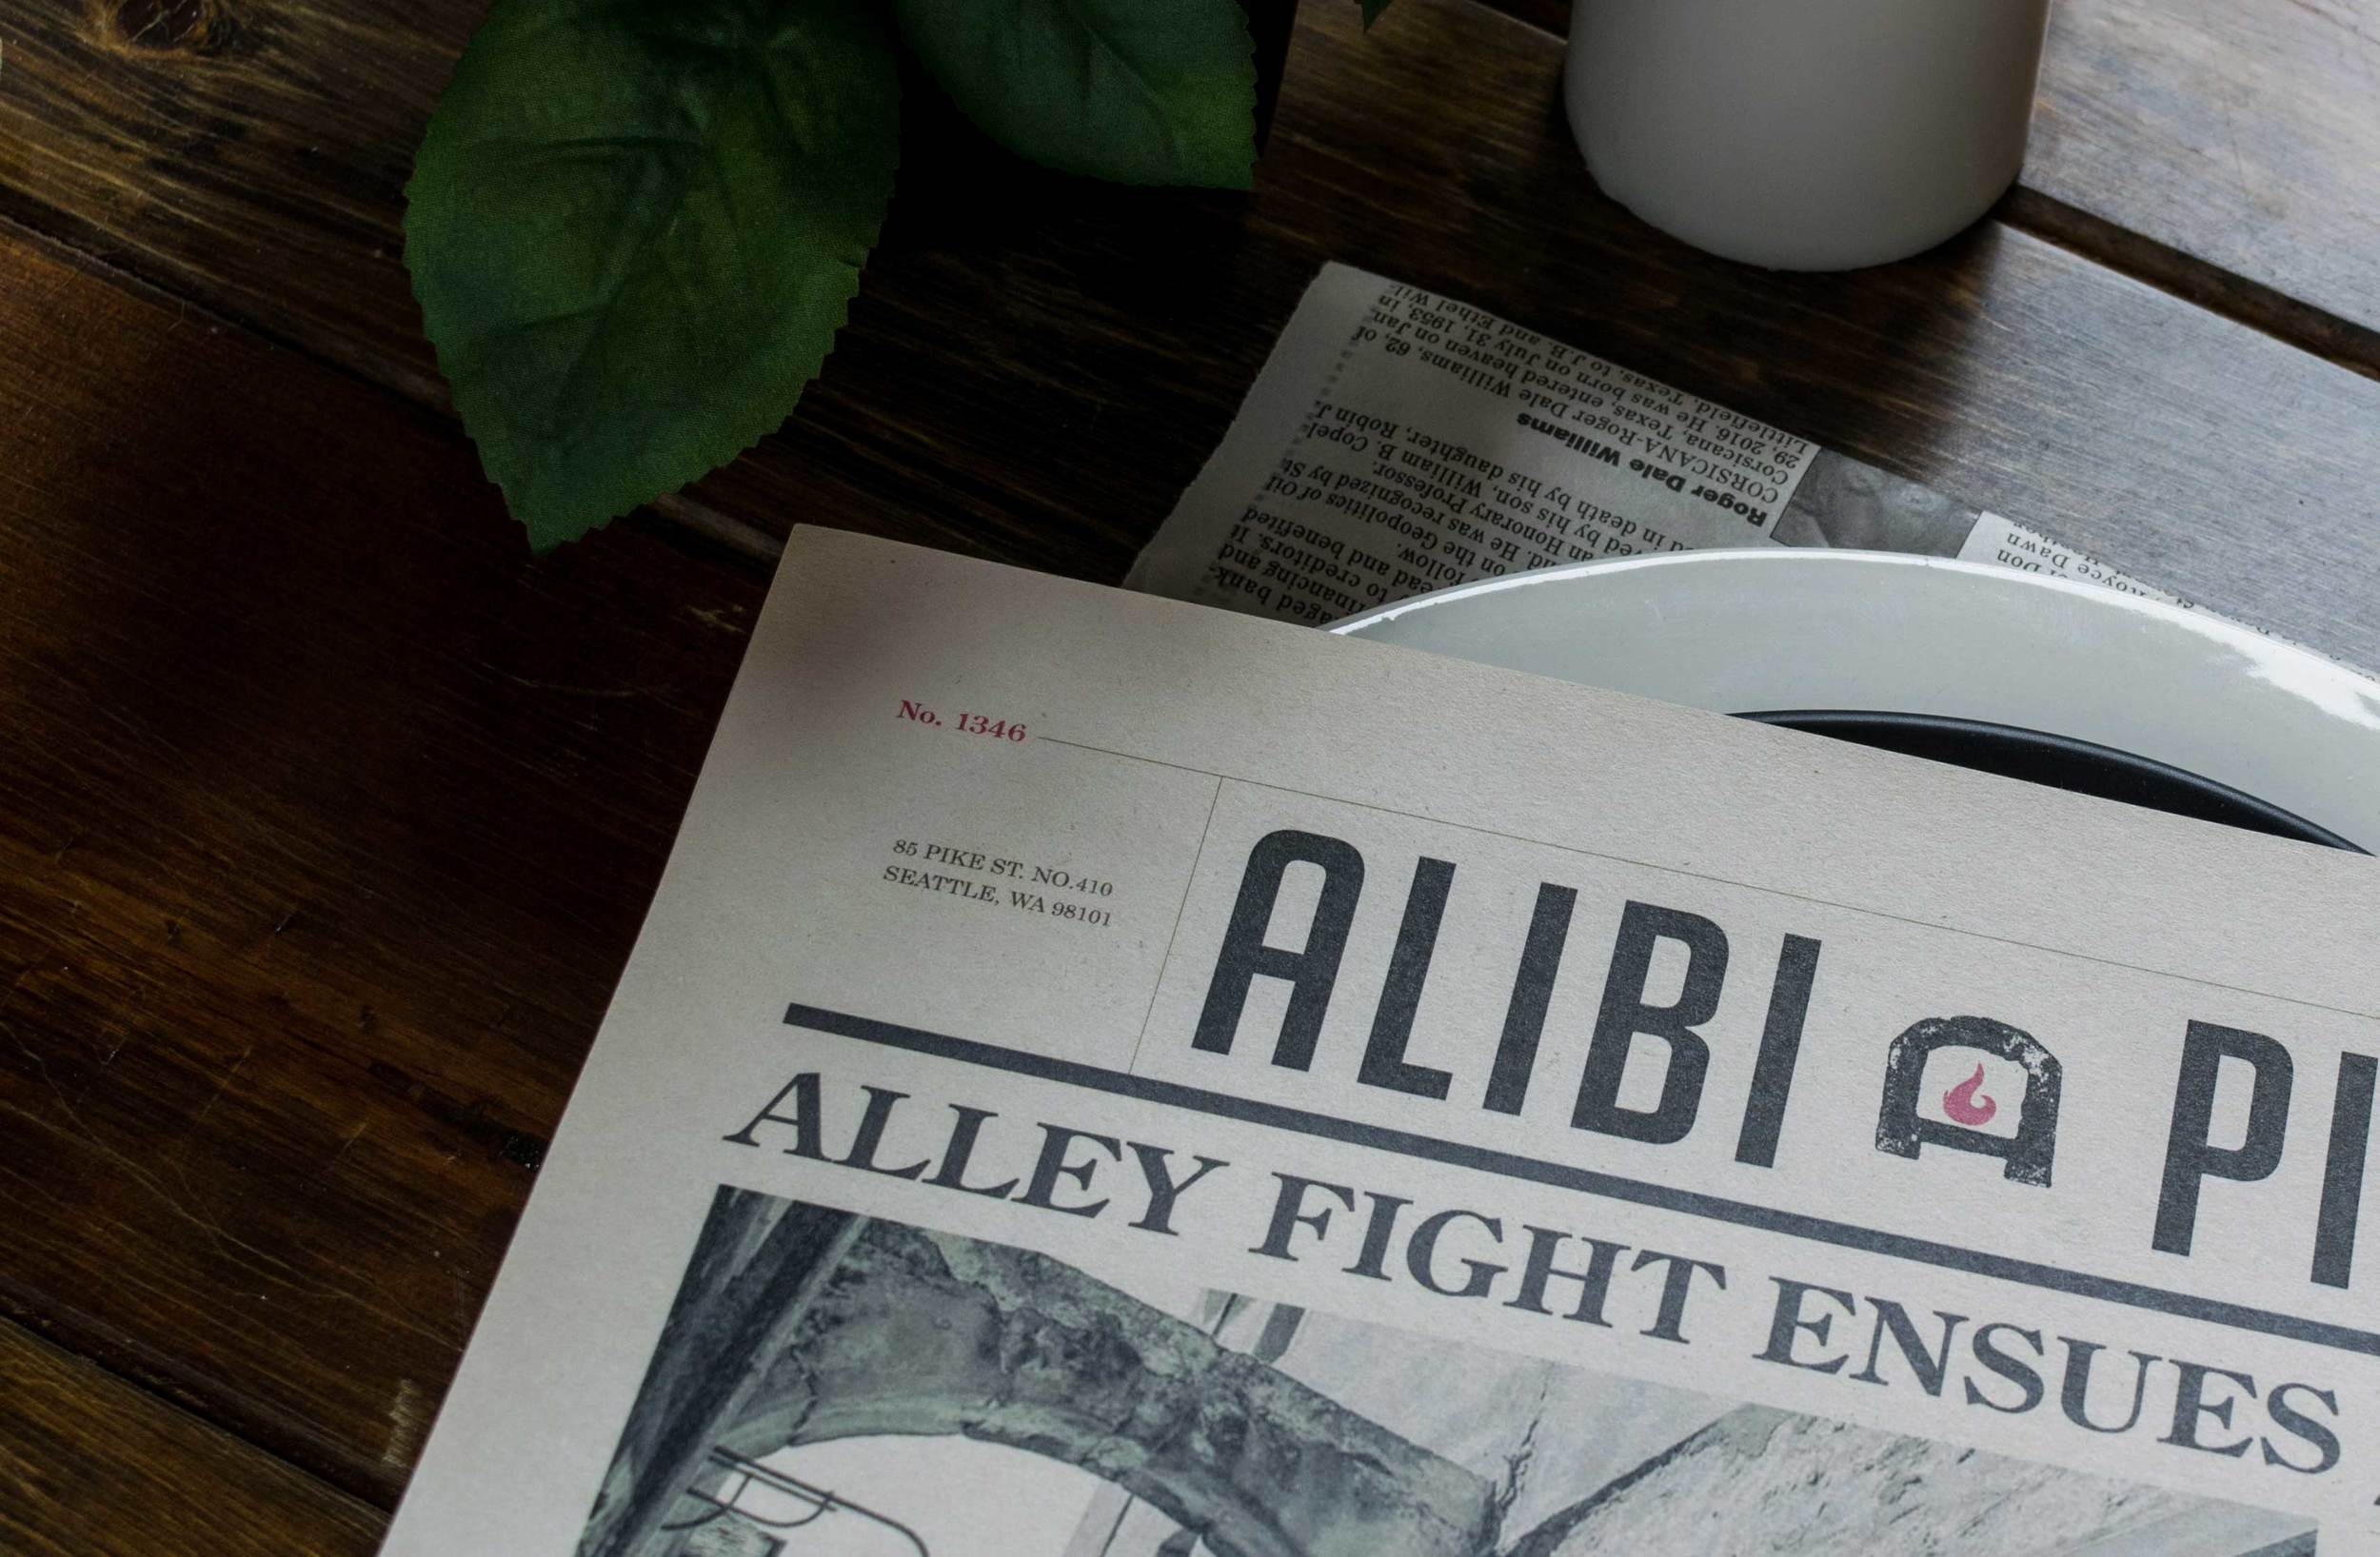 AlibiPies-1.jpg